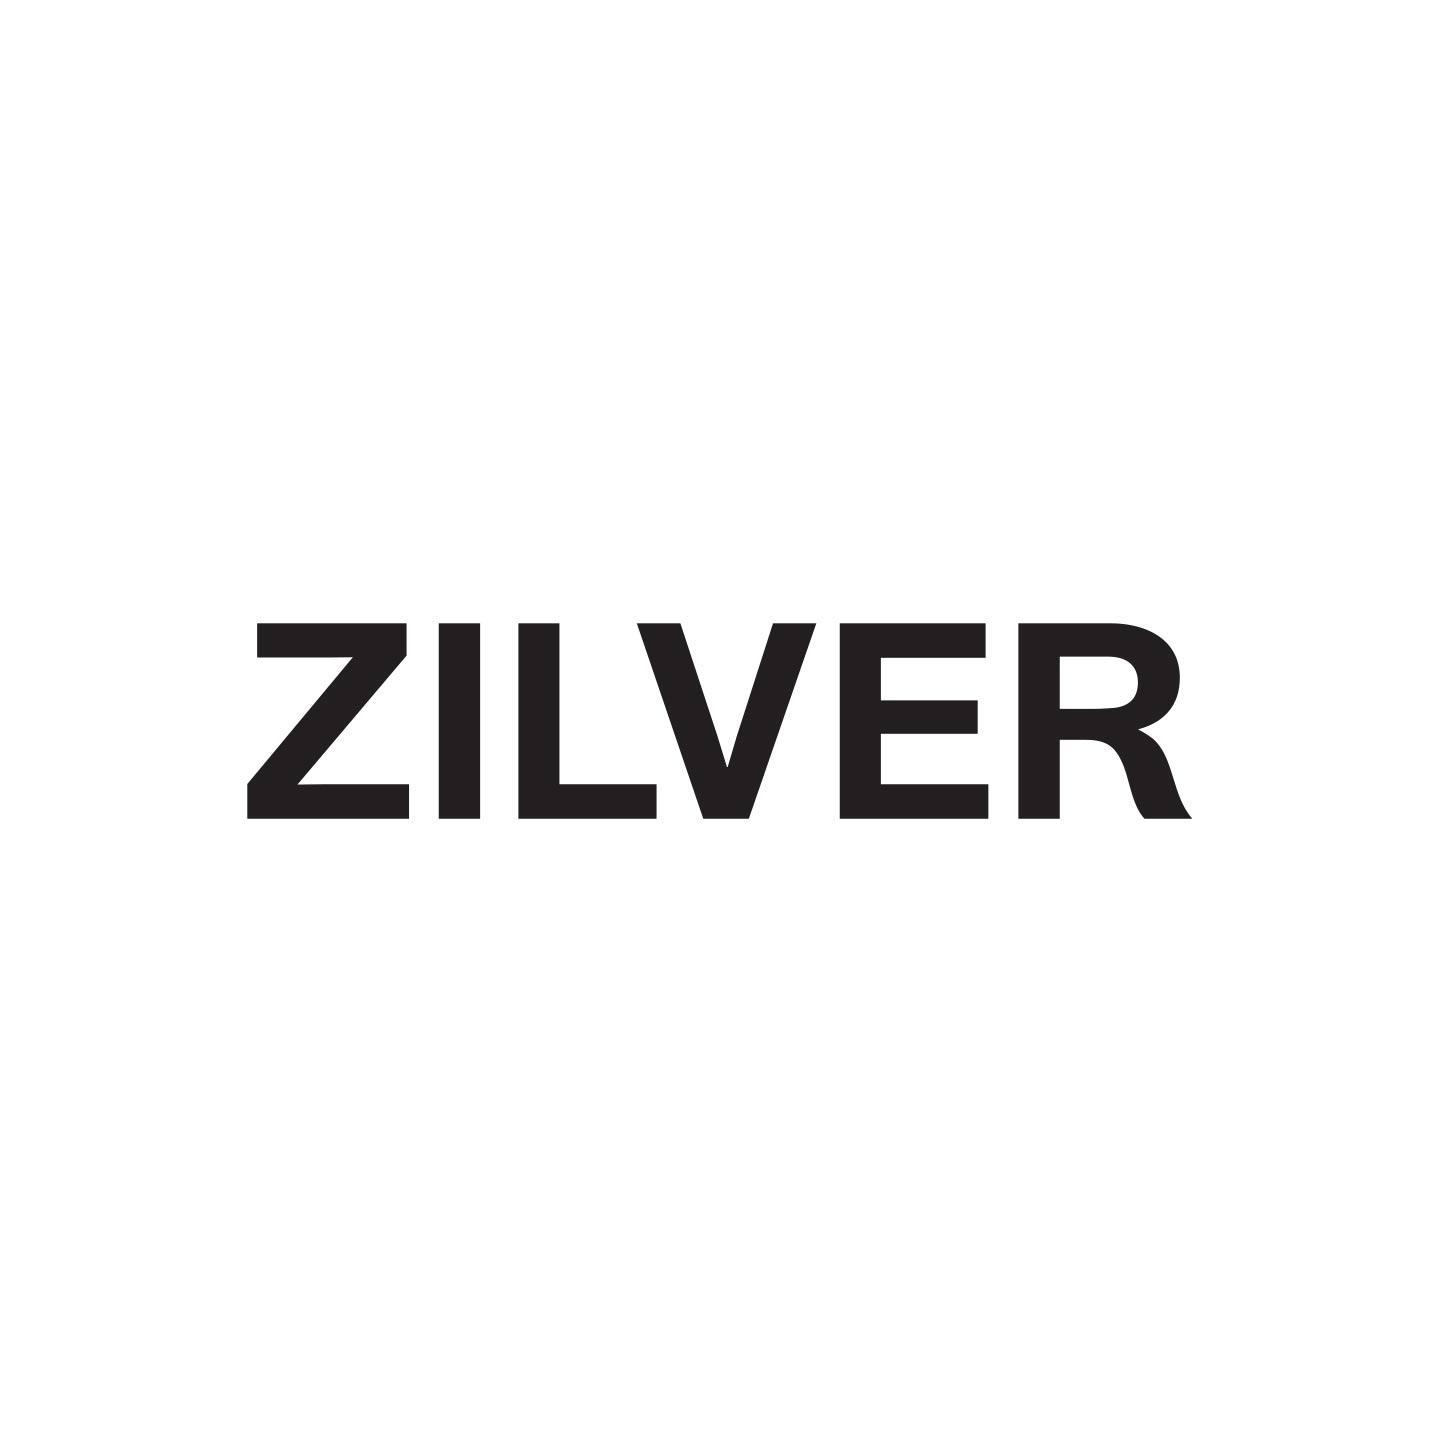 logo zilver